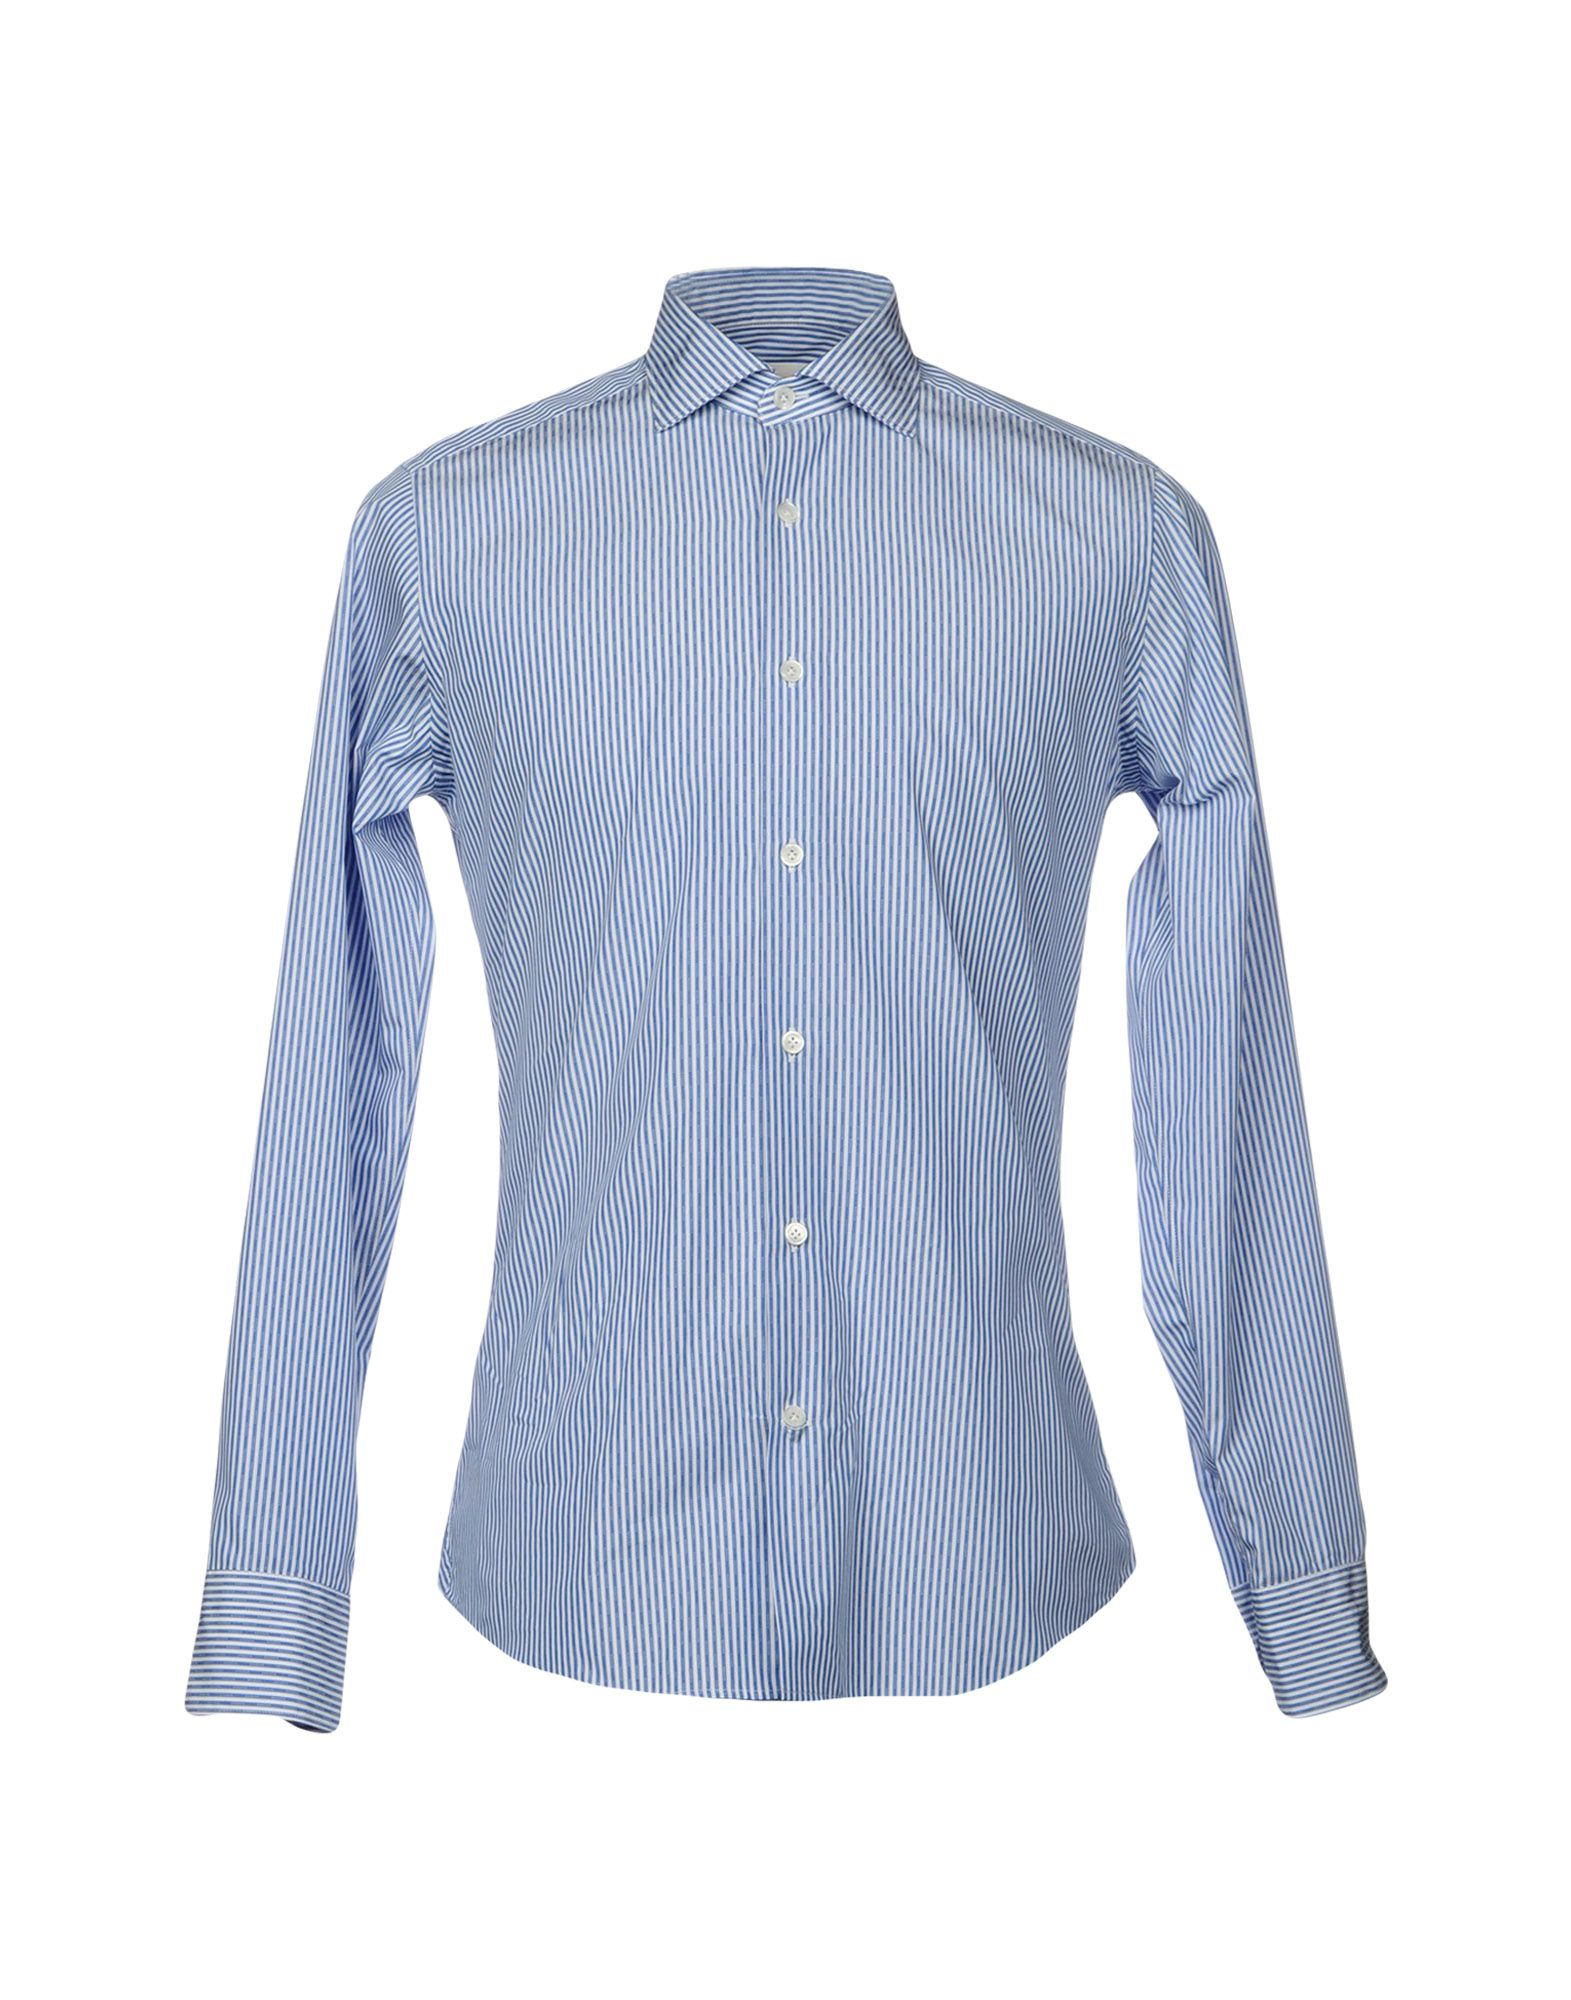 GUGLIELMINOTTI Herren Hemd Farbe Blau Größe 4